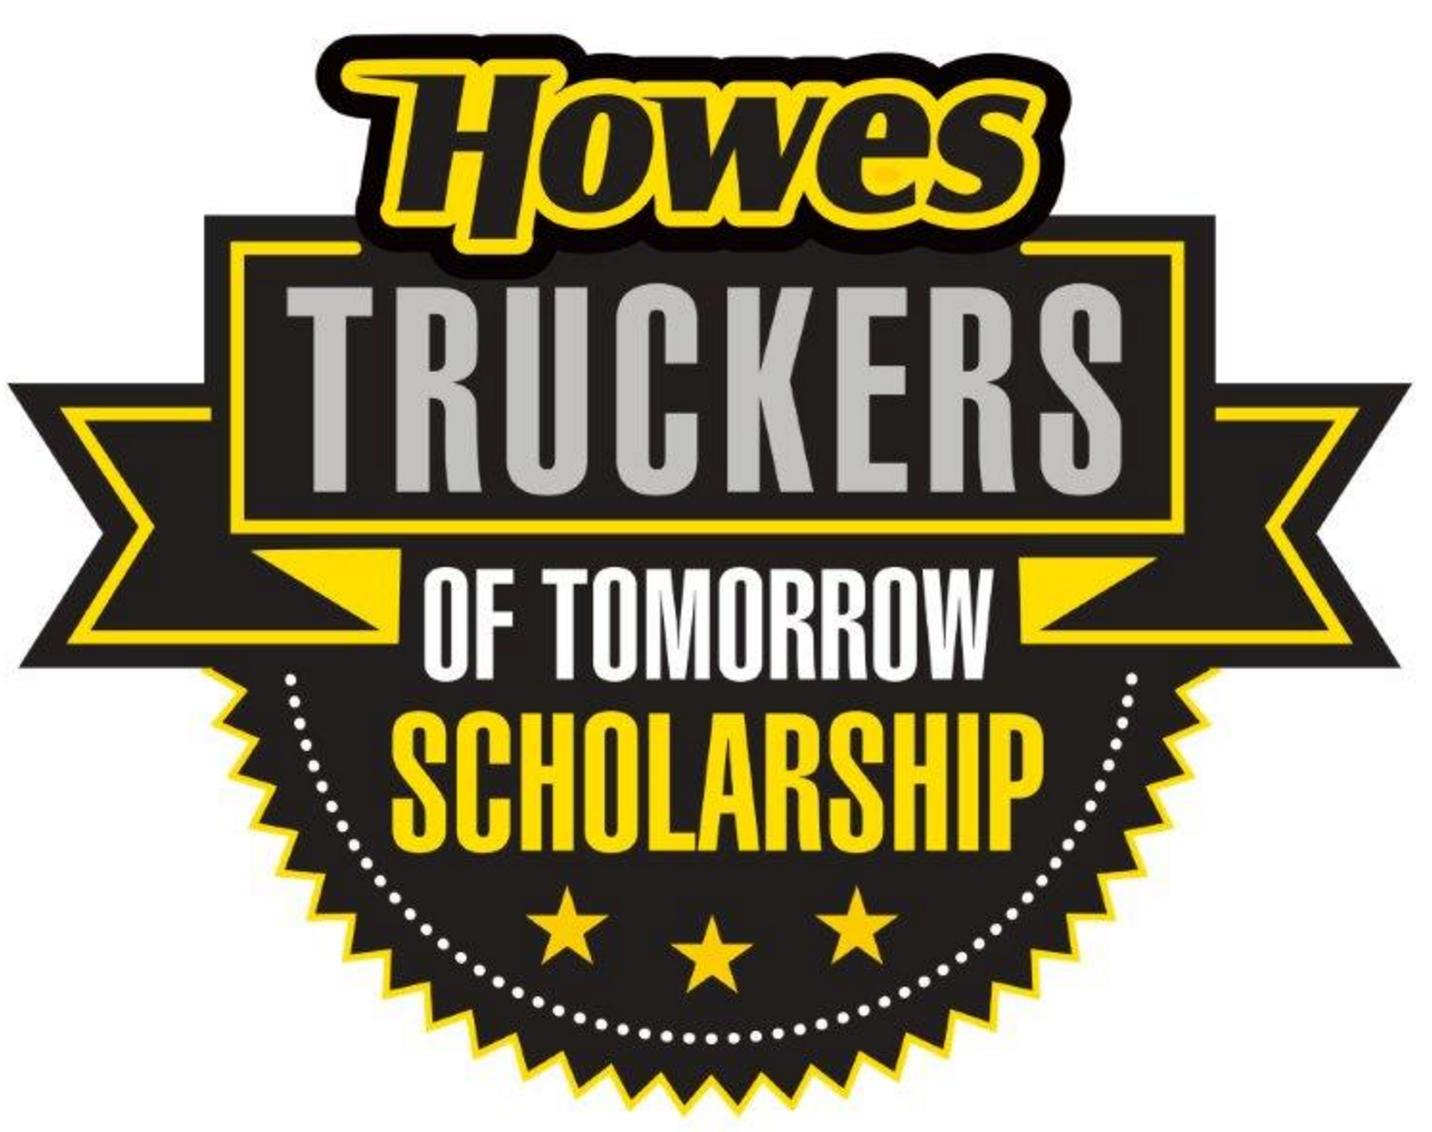 Howes, SAGE trucking schools partner to offer $25K in scholarships